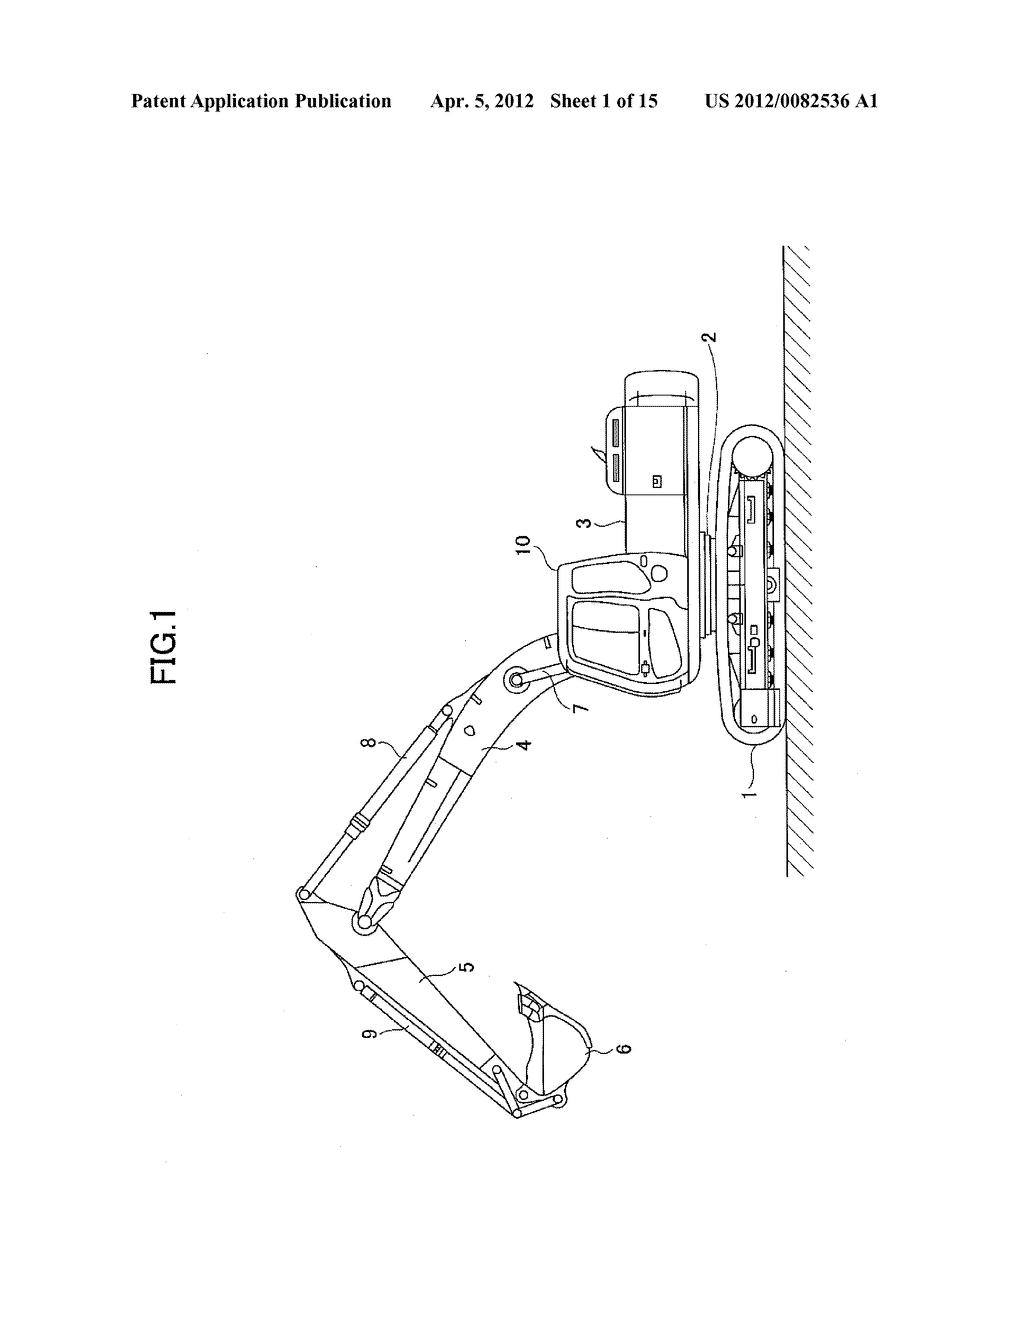 Excavator Schematic